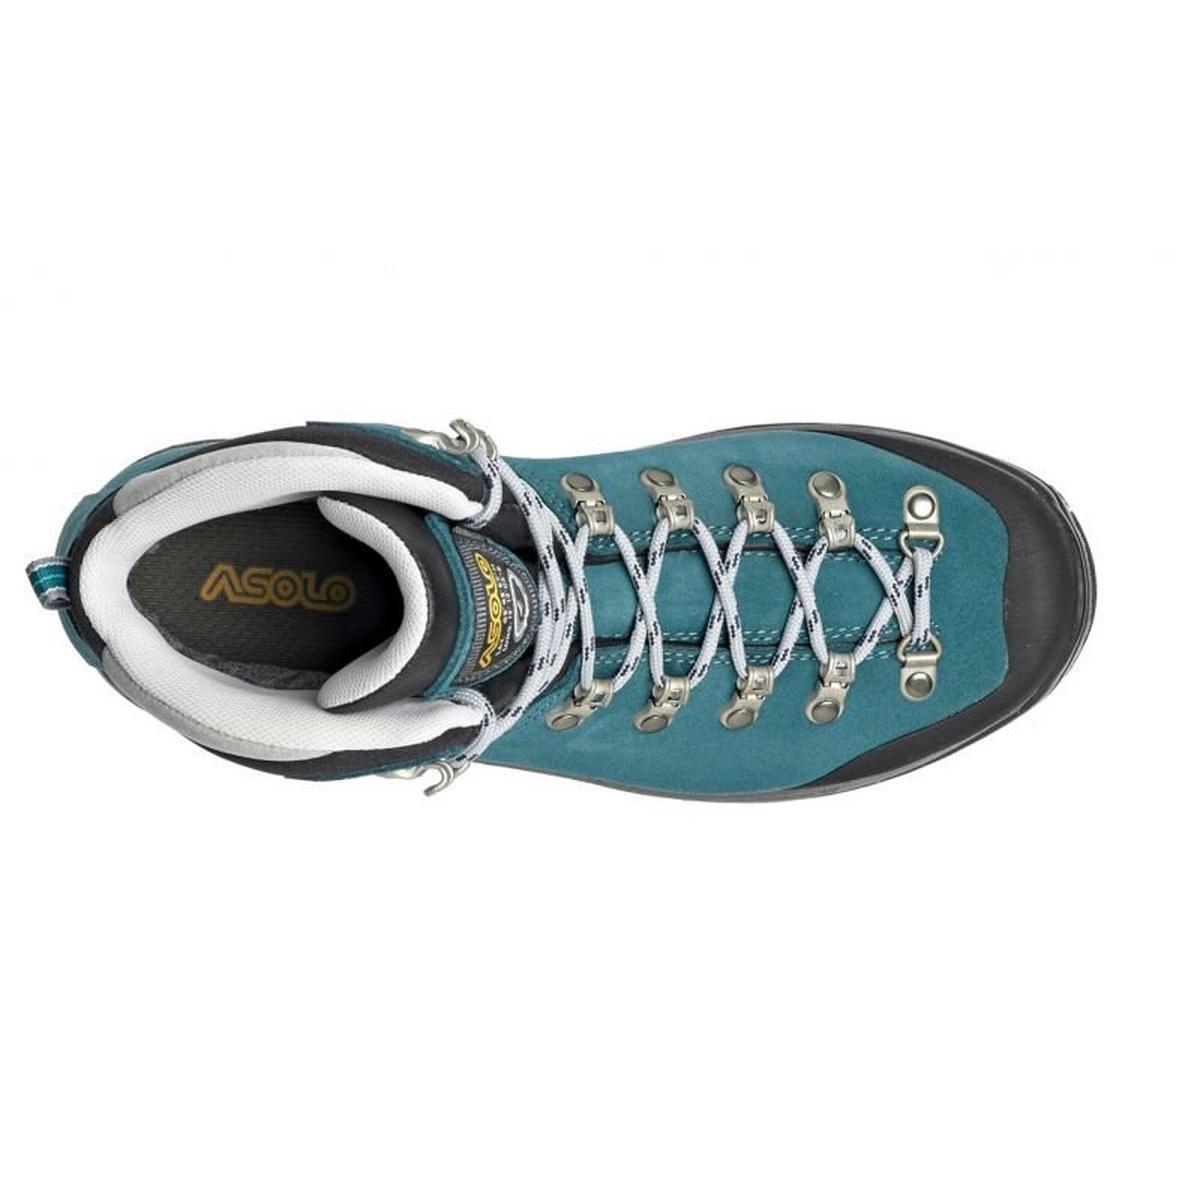 Asolo Women's Greenwood GV Hiking Boot - Blue